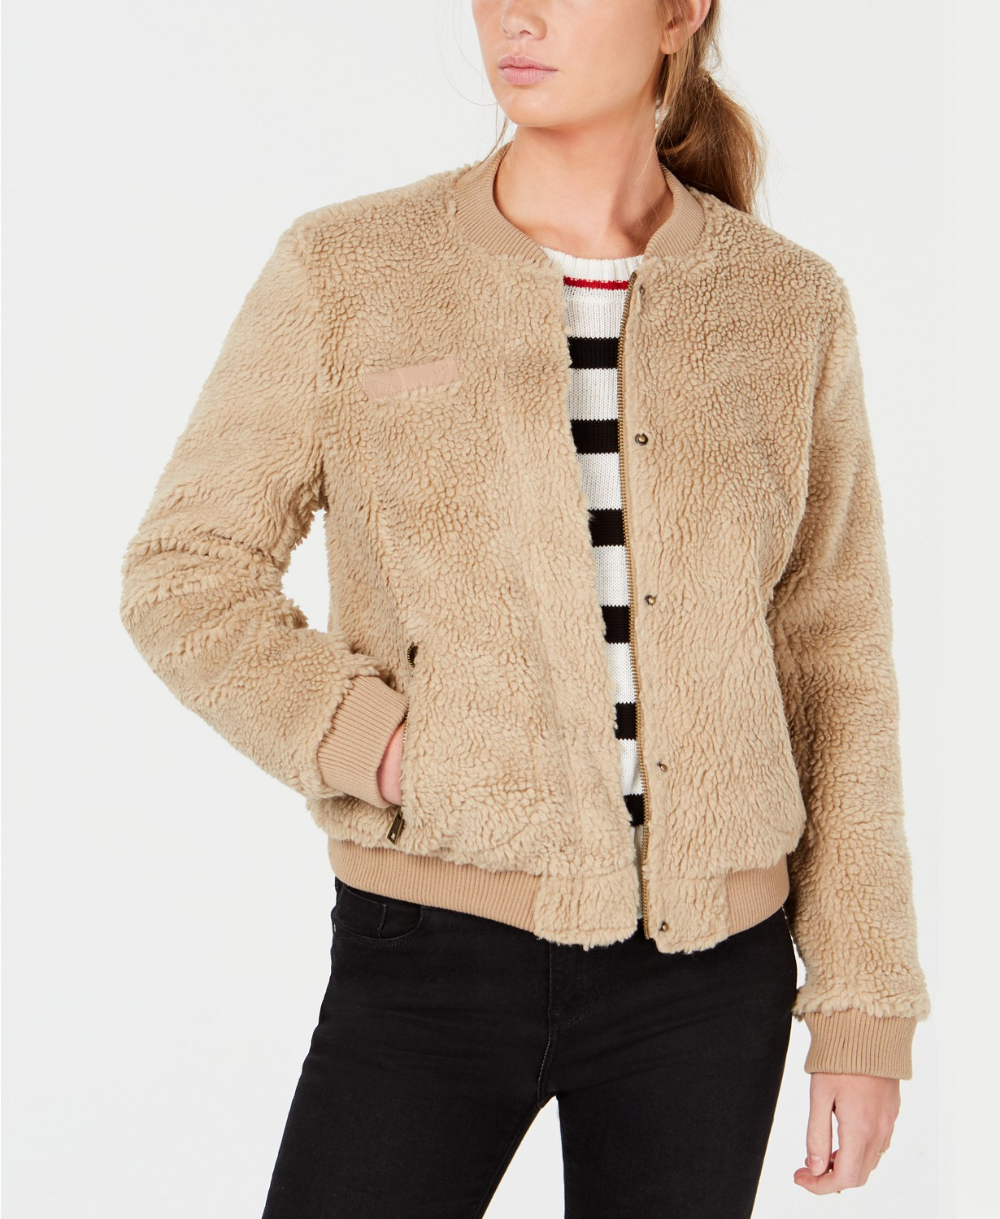 Levi S Sherpa Bomber Jacket Reviews Jackets Vests Juniors Macy S Bomber Jacket Women Faux Fur Bomber Jacket Jackets For Women [ 1219 x 1000 Pixel ]